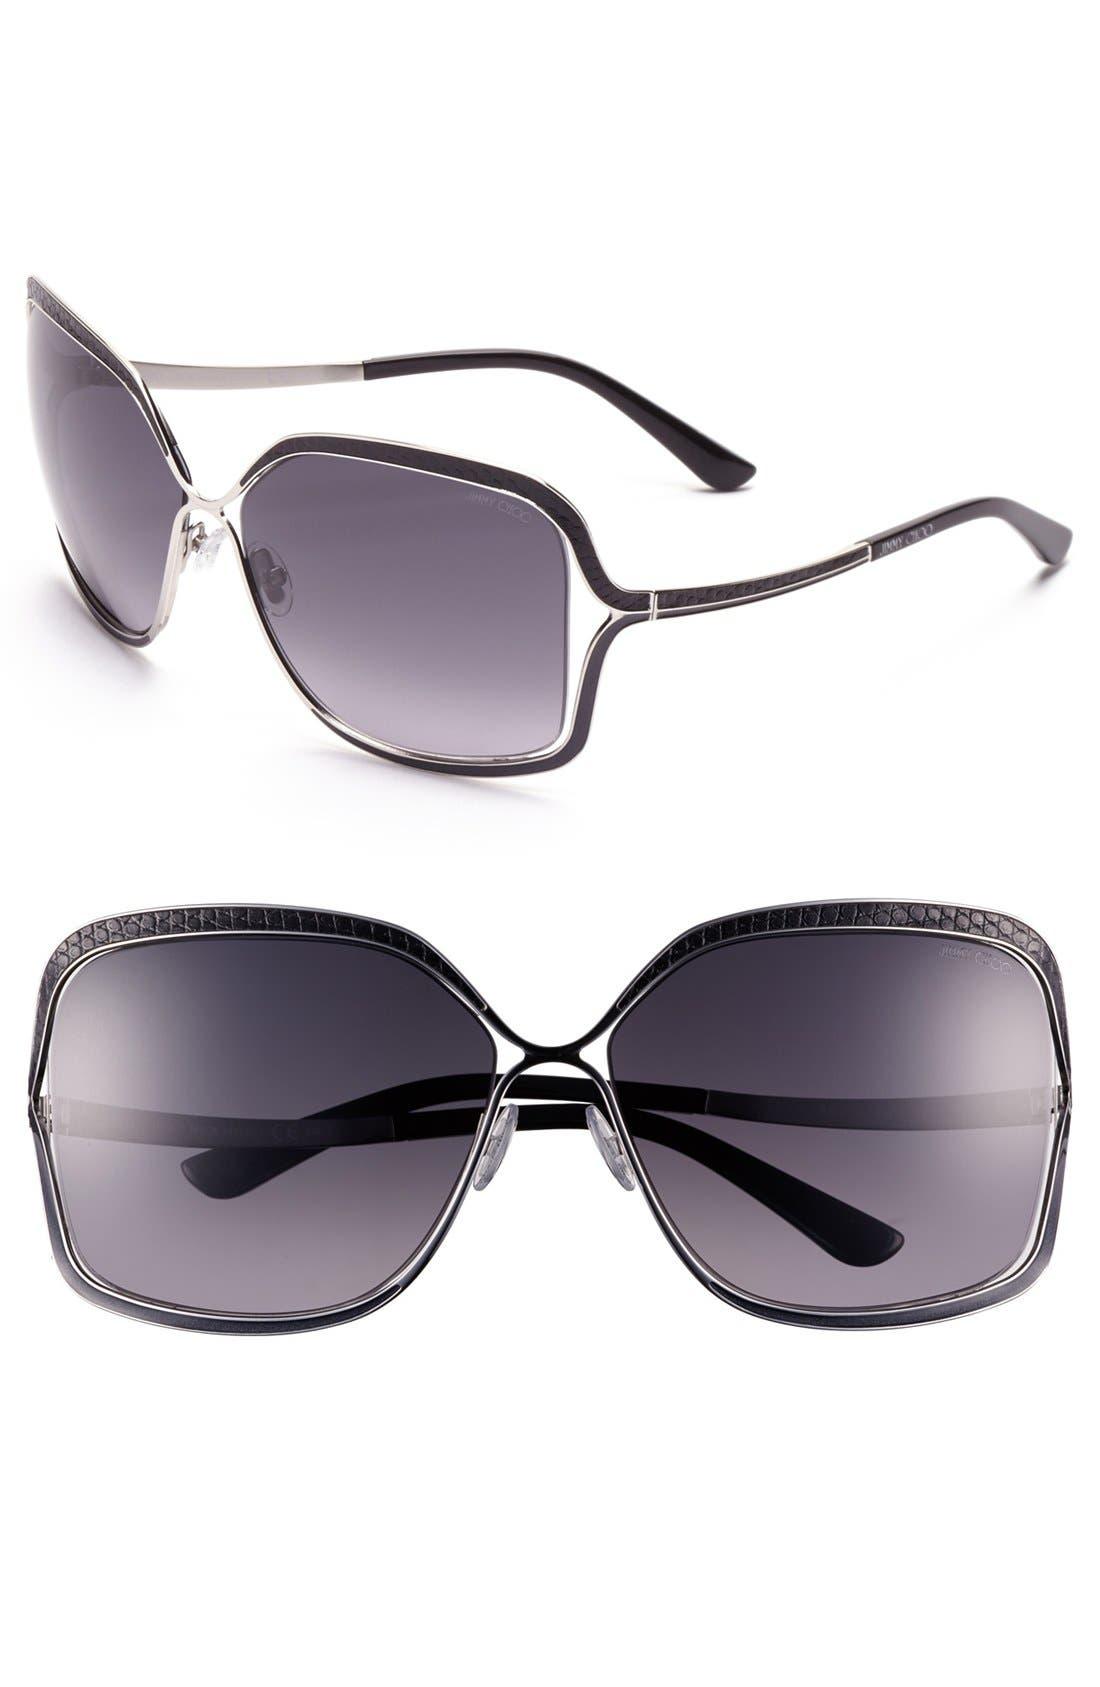 Main Image - Jimmy Choo 63mm Oversized Sunglasses